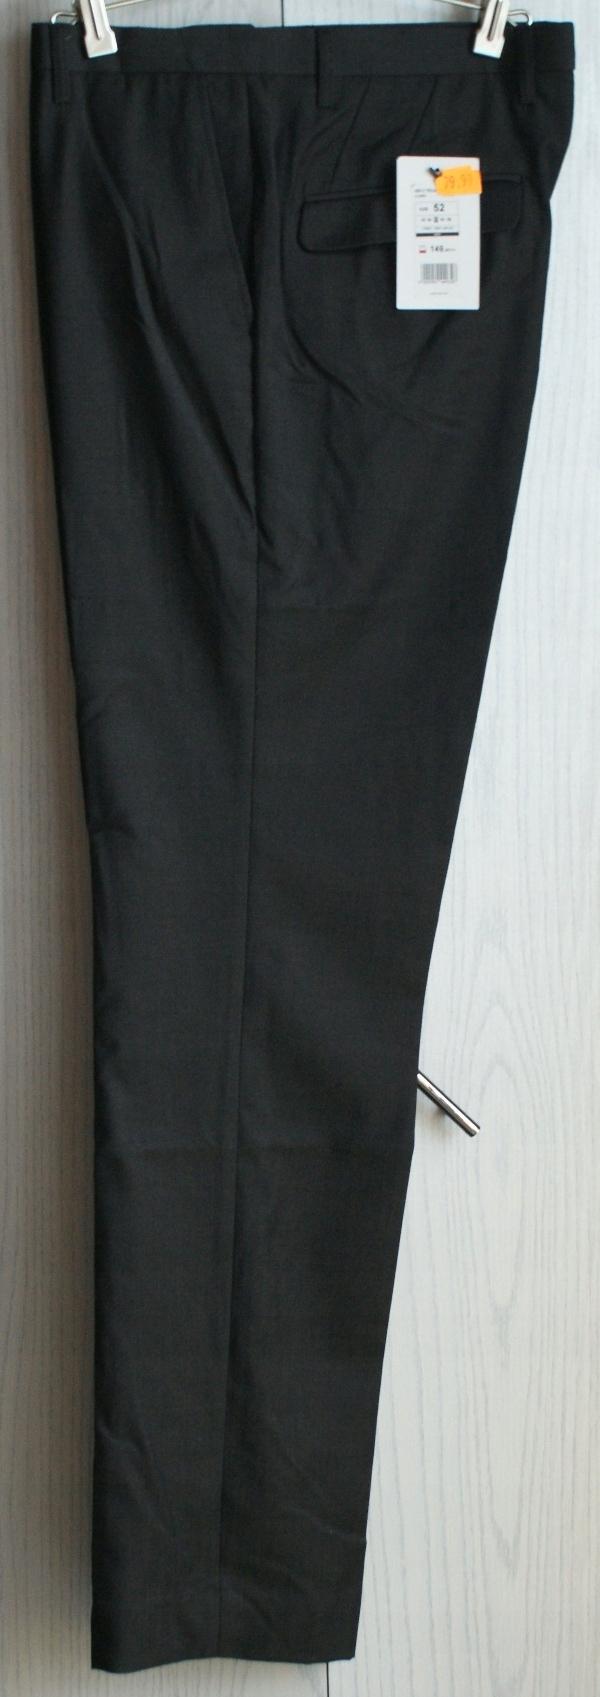 Spodnie Reserved classic O2811-90X-52 52 pas 91 cm